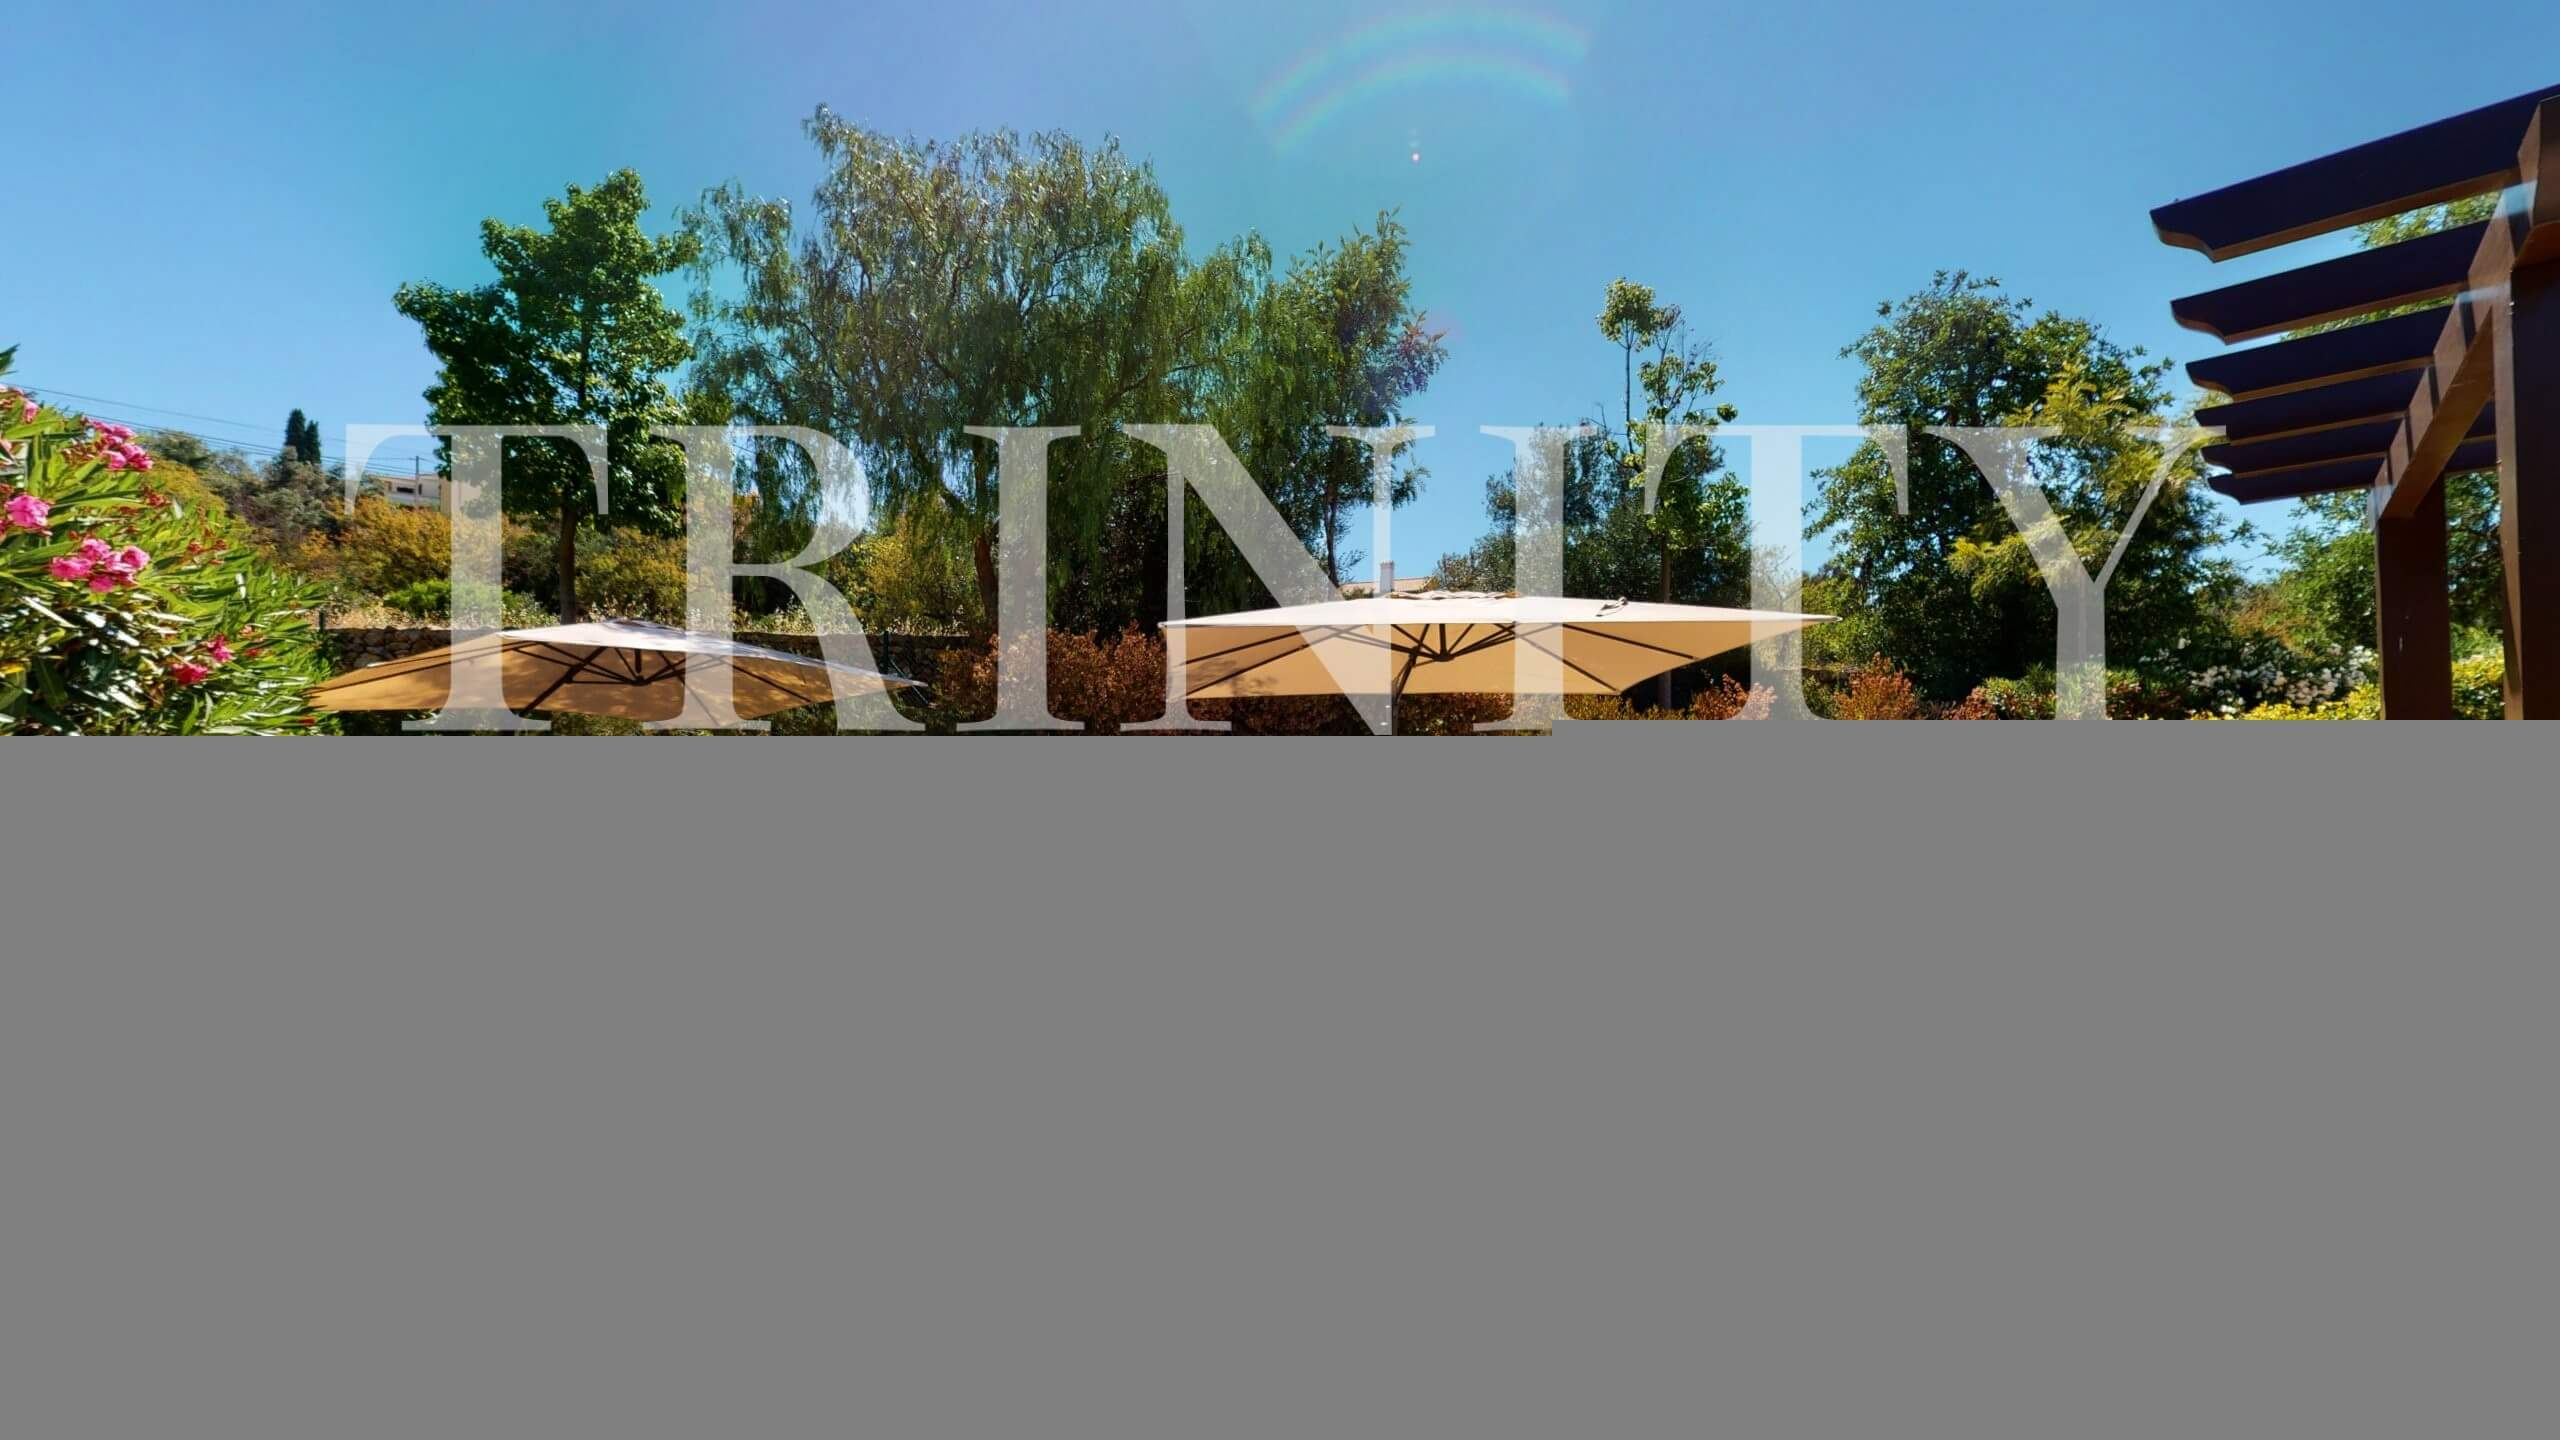 35-The-Crest-by-Trinity-Algarve-07032020_113242